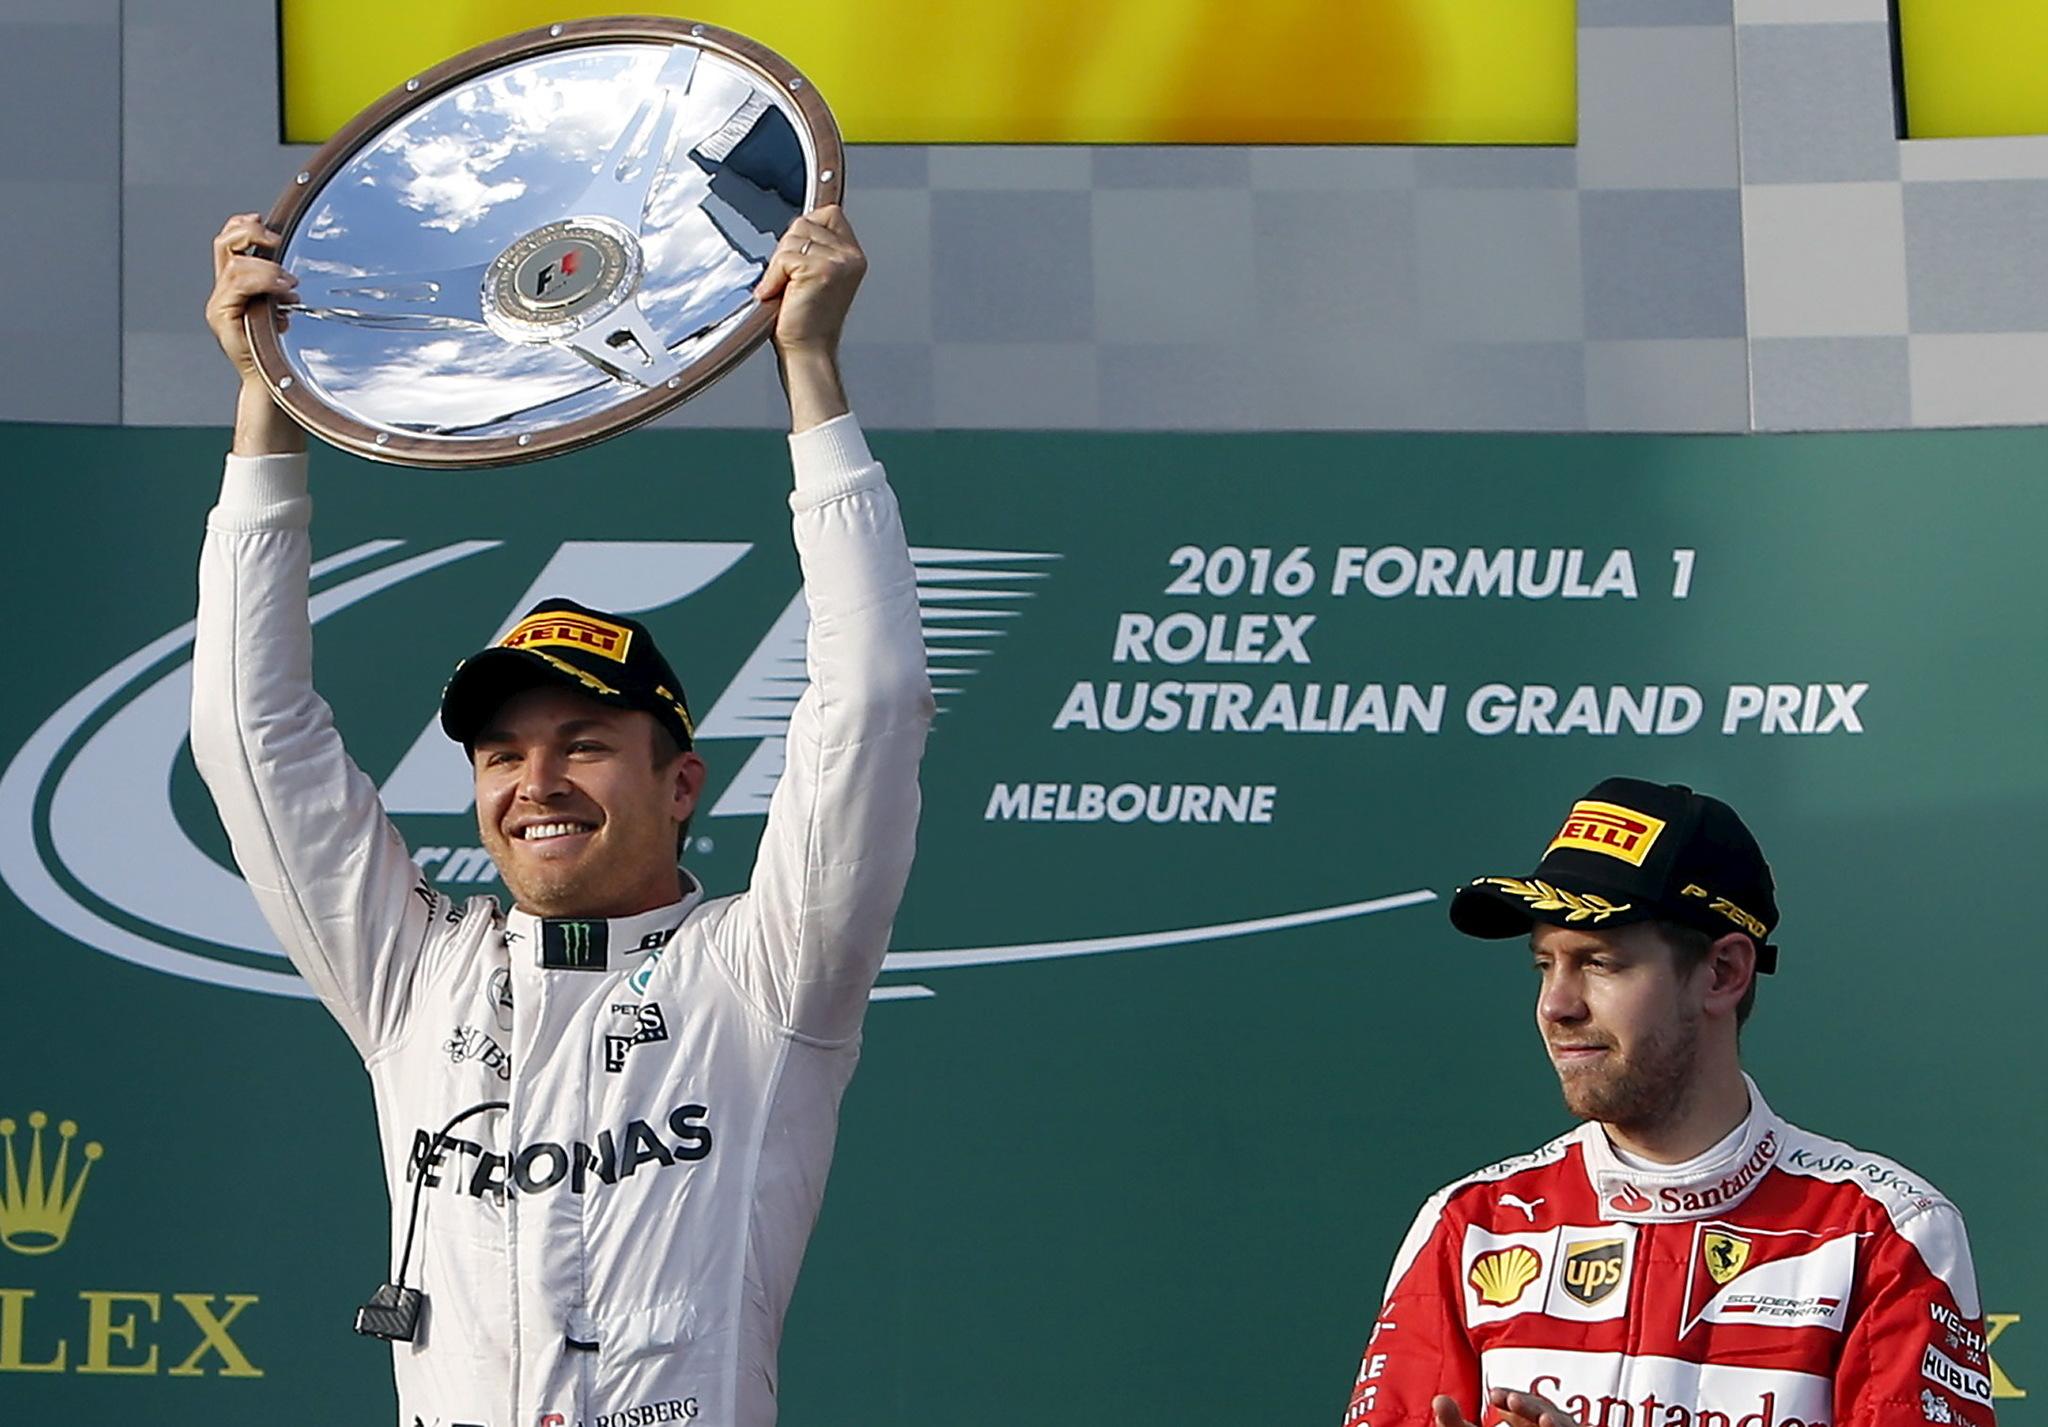 El Gran Premio de Australia (20 de Marzo) era la primera carrera de la...